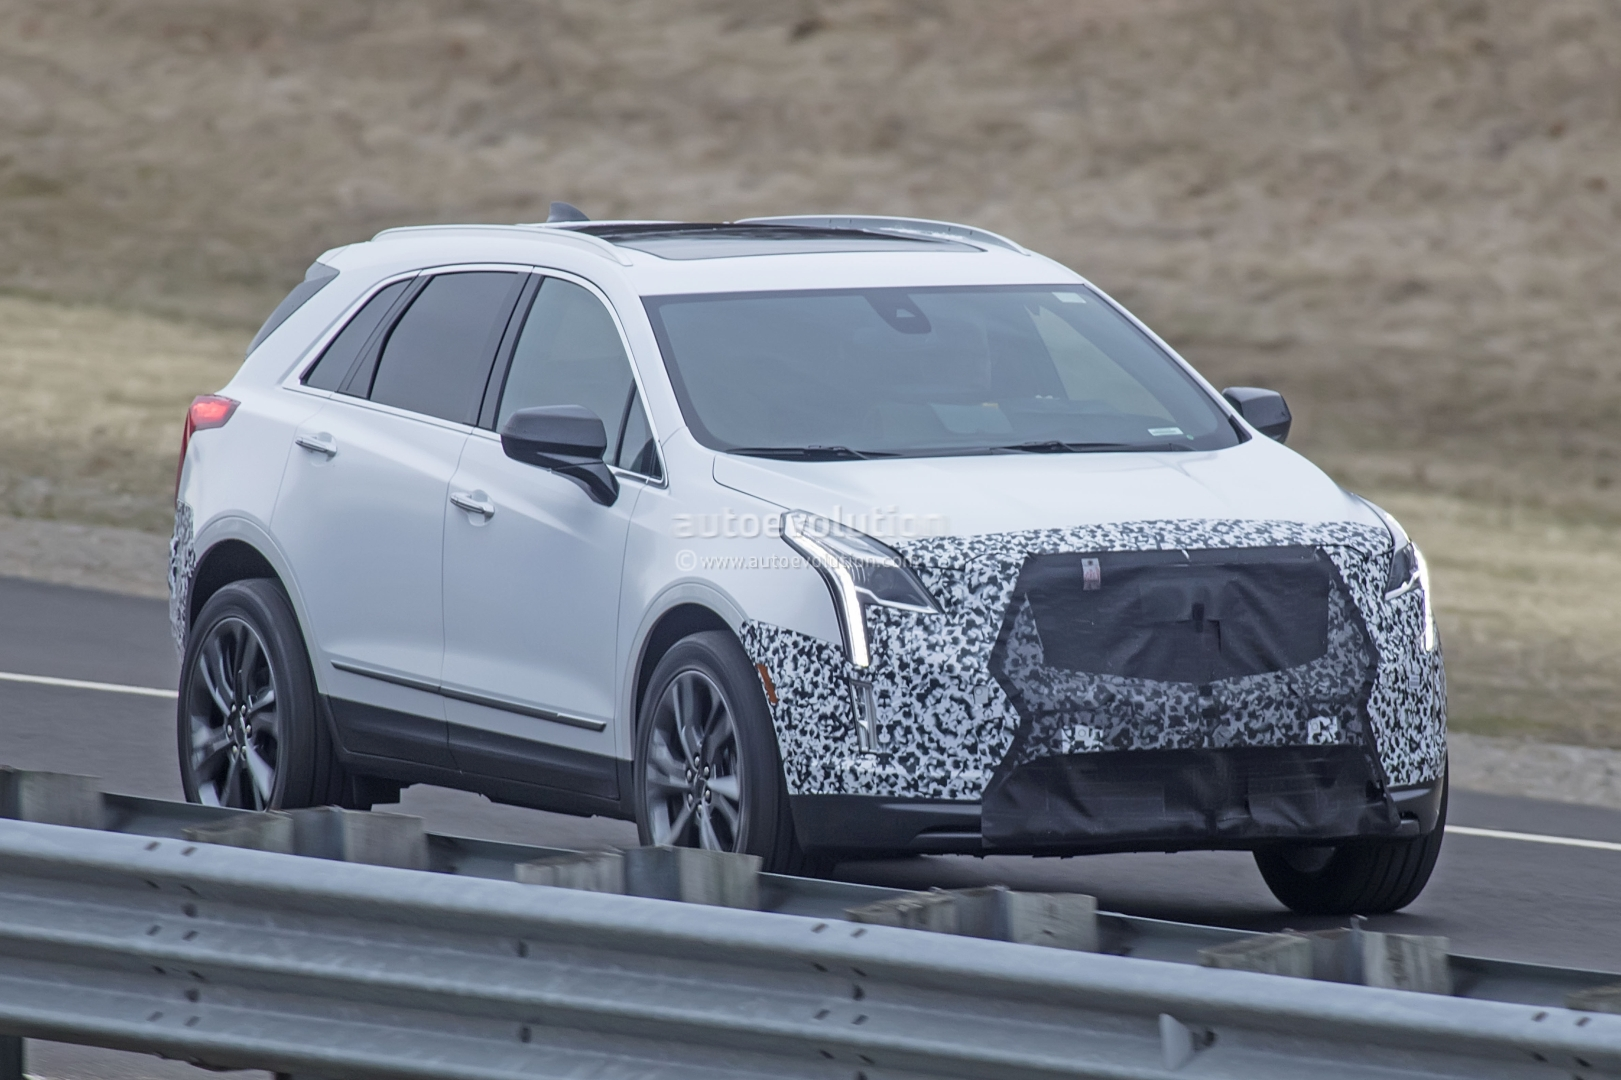 2020 Spy Shots Cadillac Xt5 Redesign